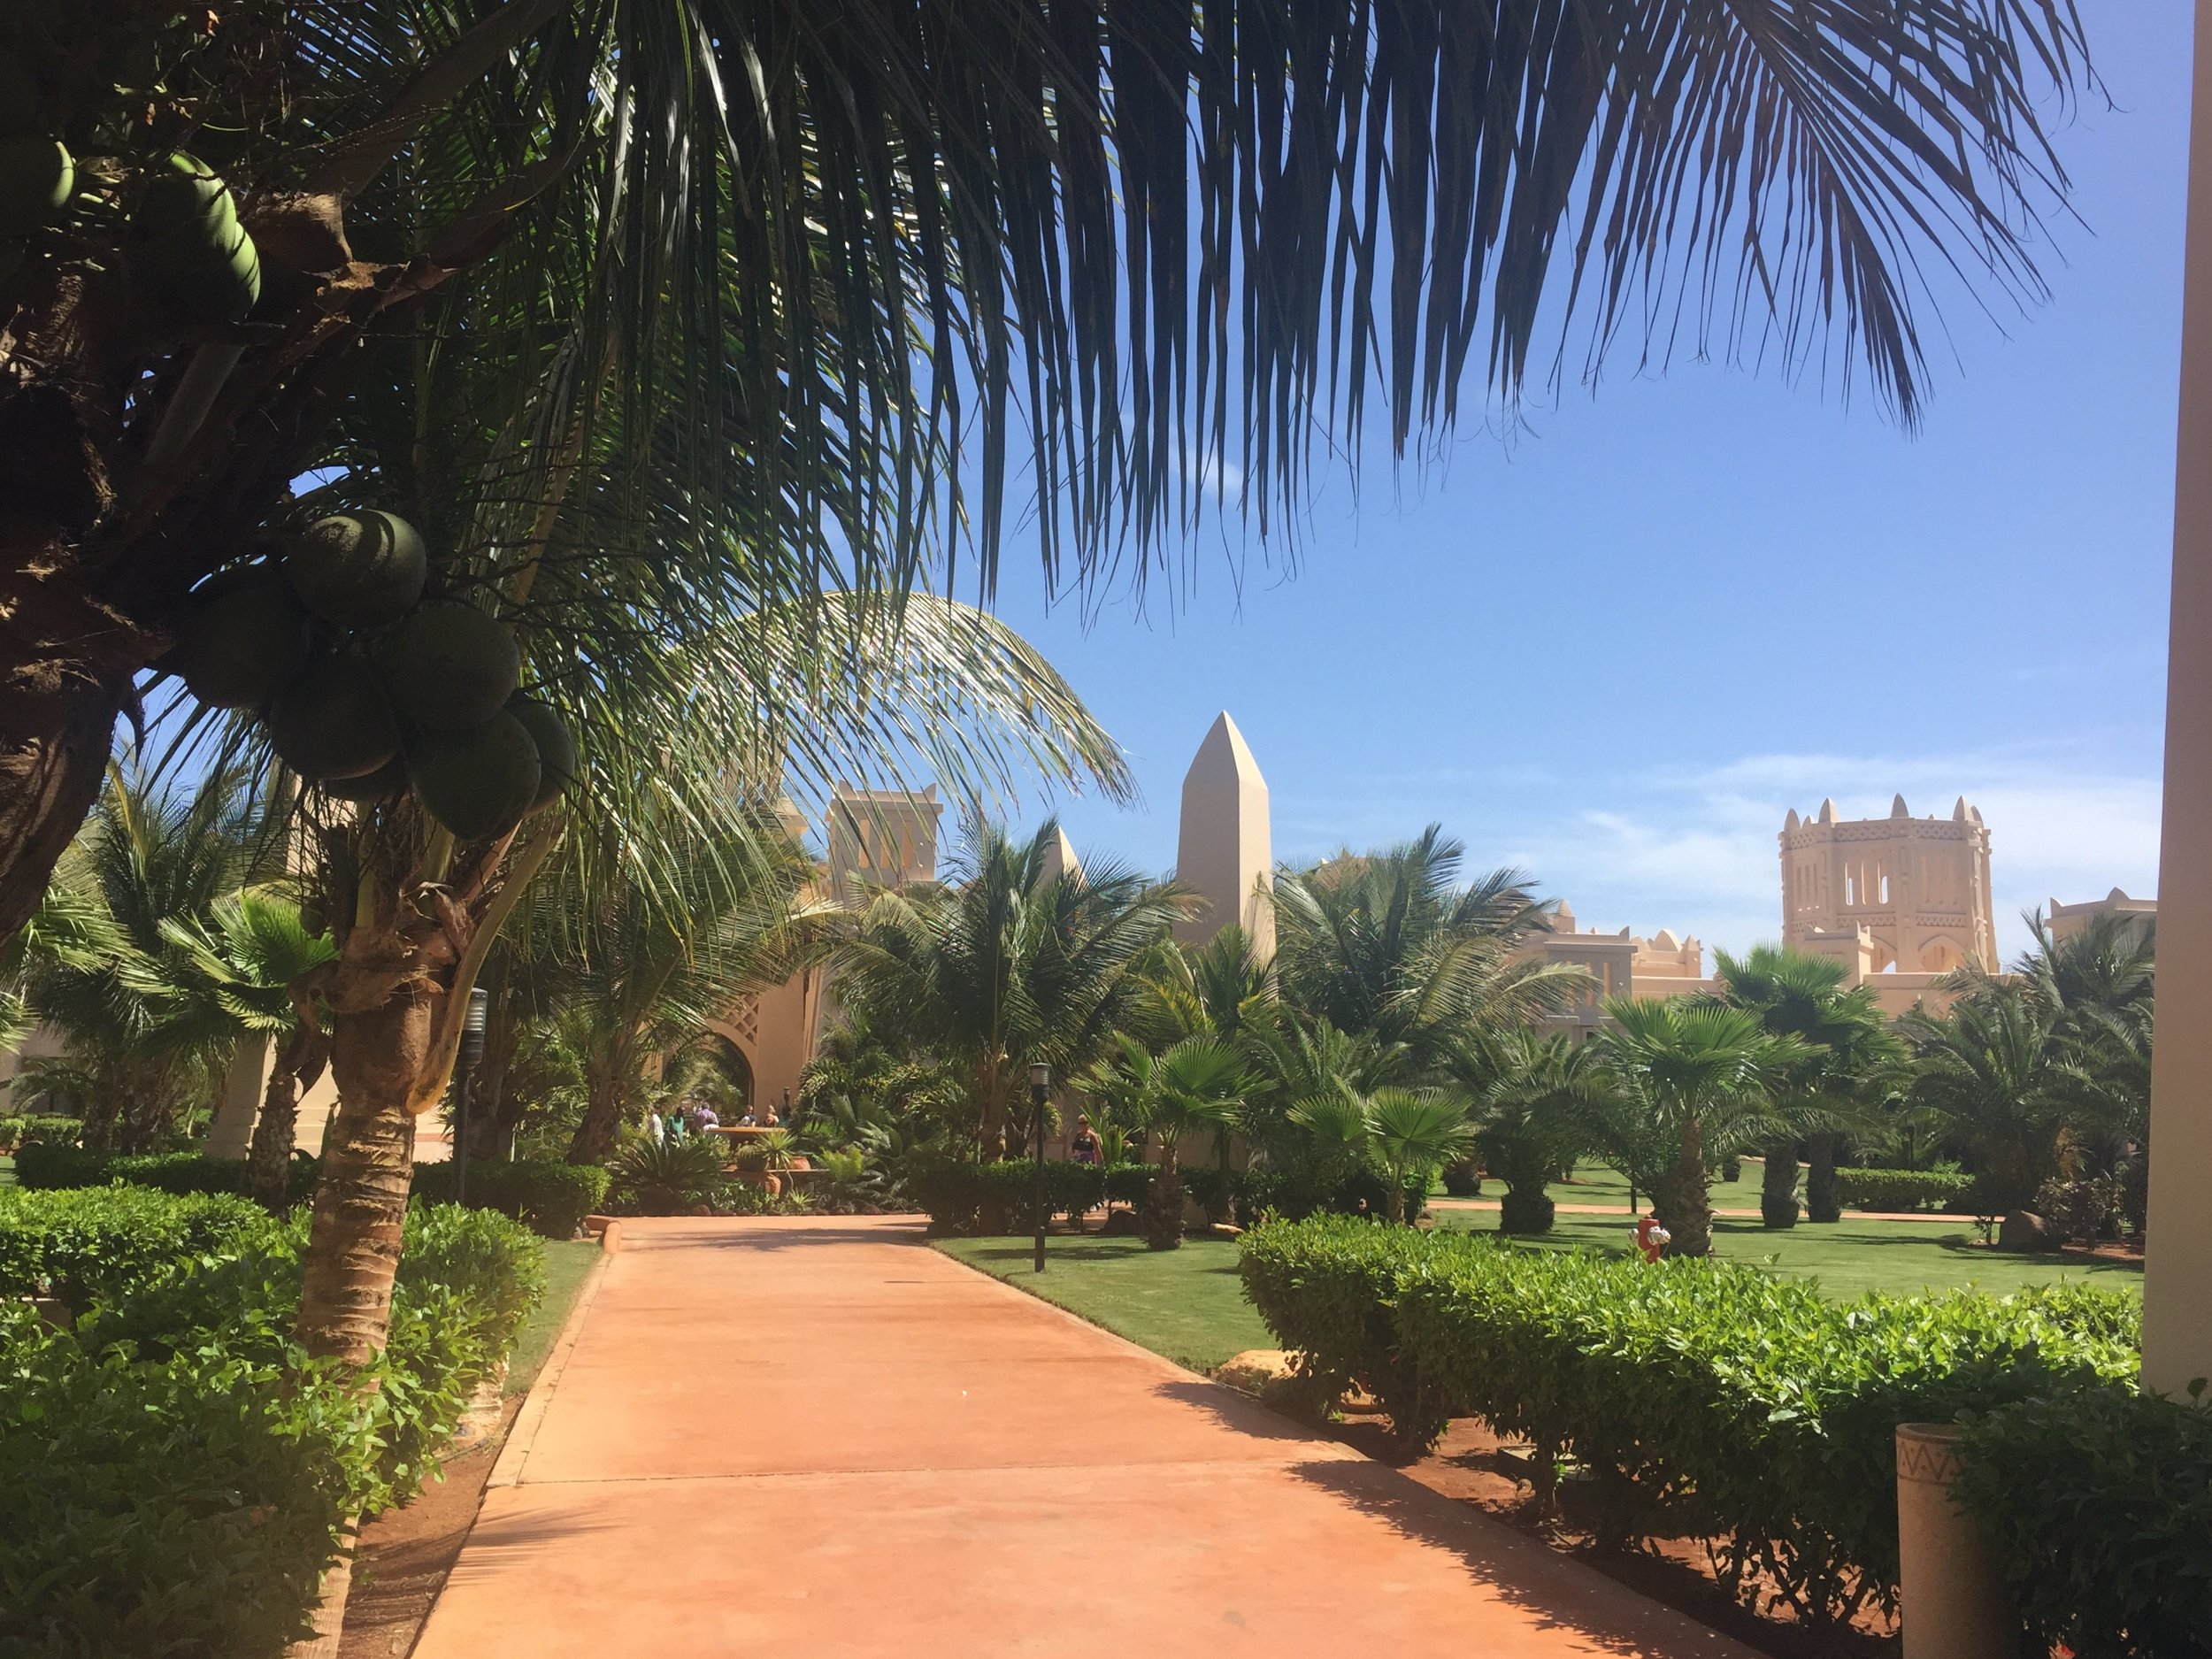 Riu Touareg Hotel, Boa Vista, Cape Verde